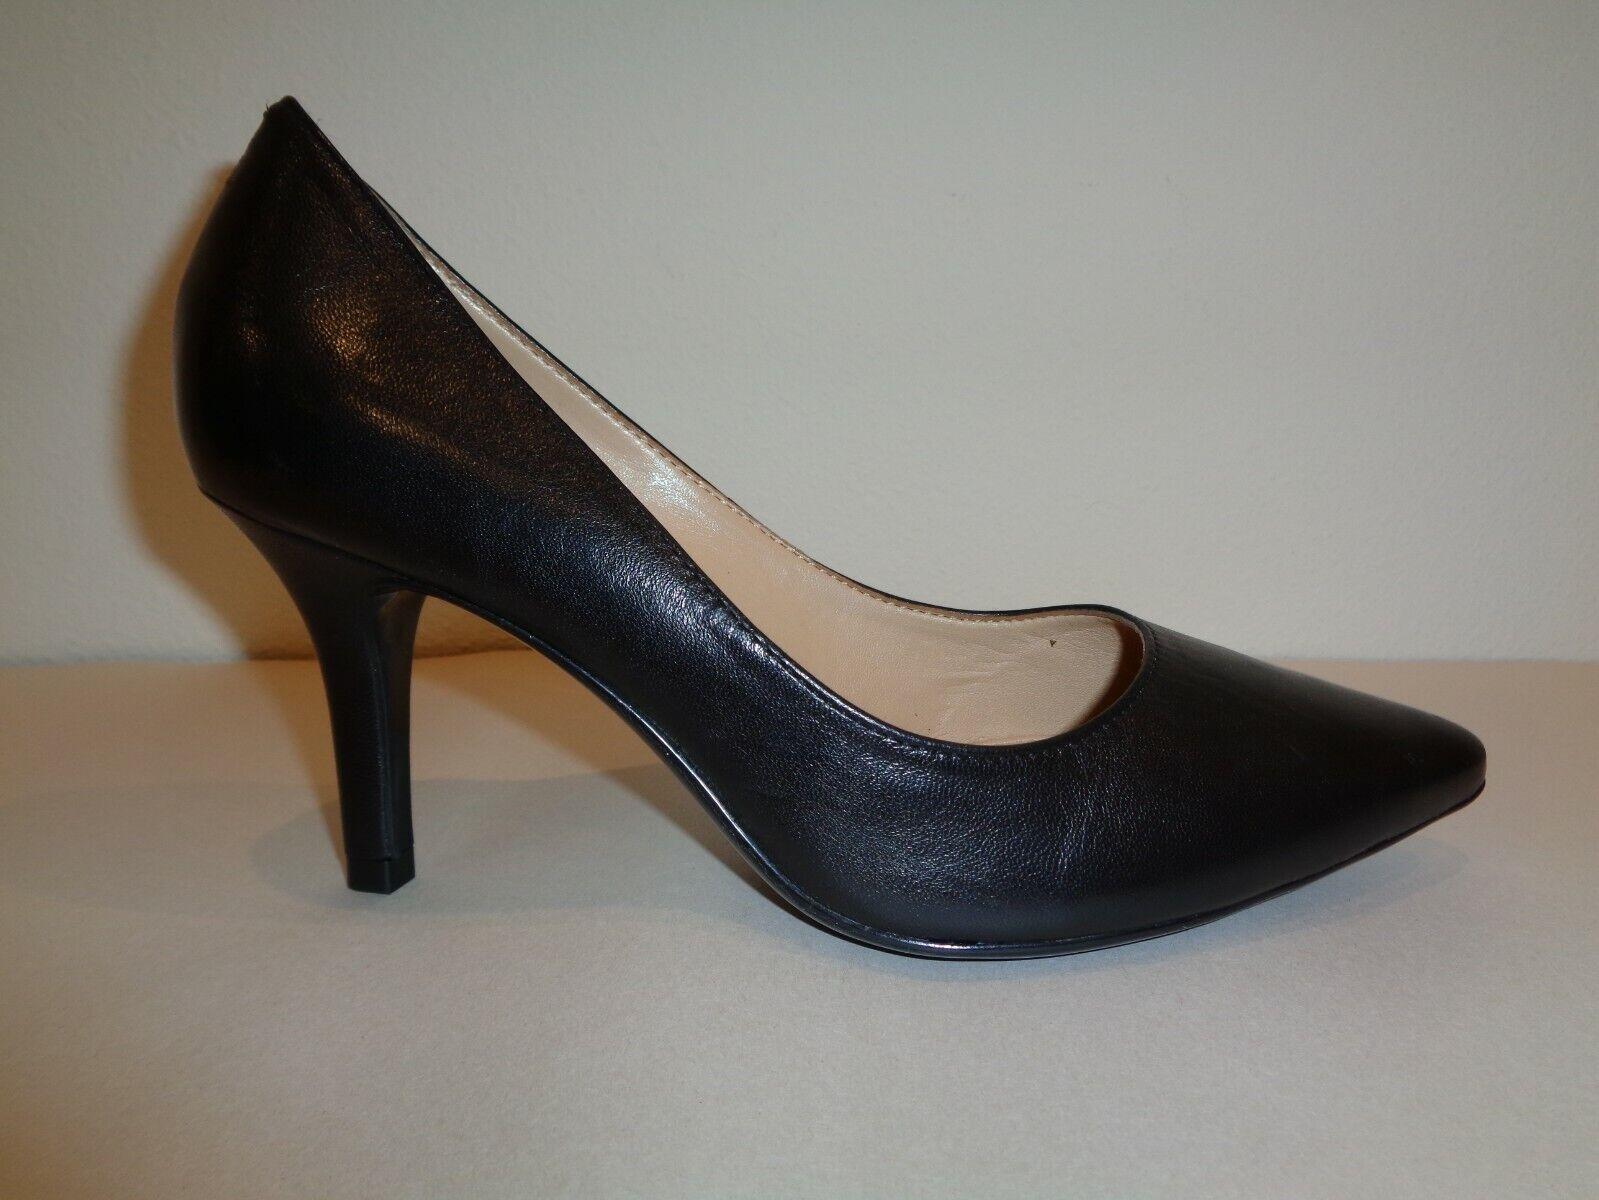 Antonio Melani Size 8 M ODETAH Black Leather Heels Pumps New Womens shoes